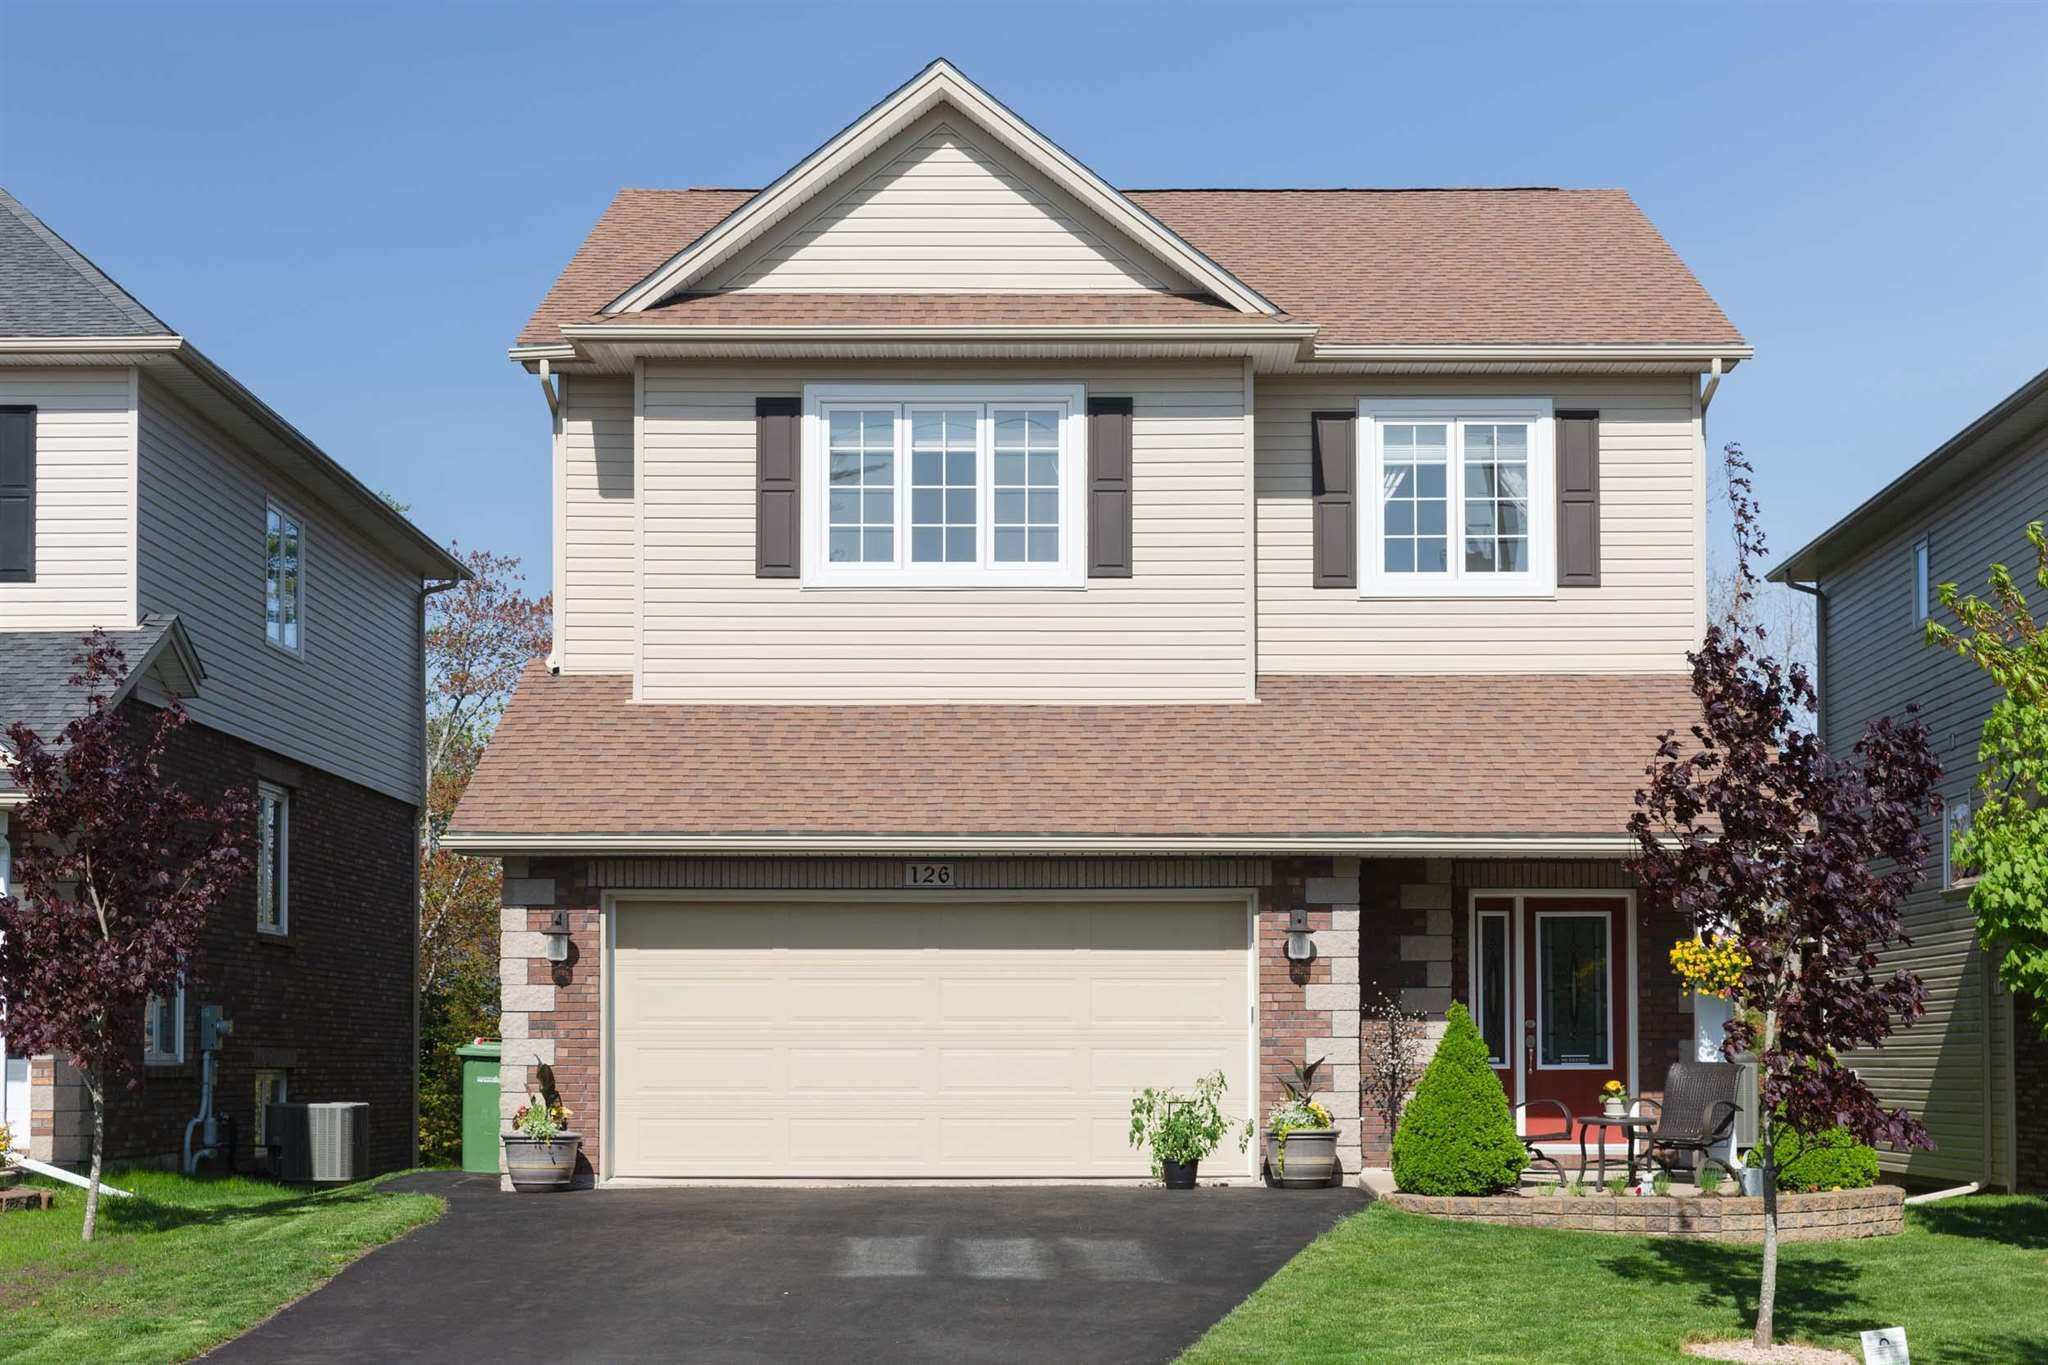 Main Photo: 126 Windridge Lane in Bedford: 20-Bedford Residential for sale (Halifax-Dartmouth)  : MLS®# 202112941